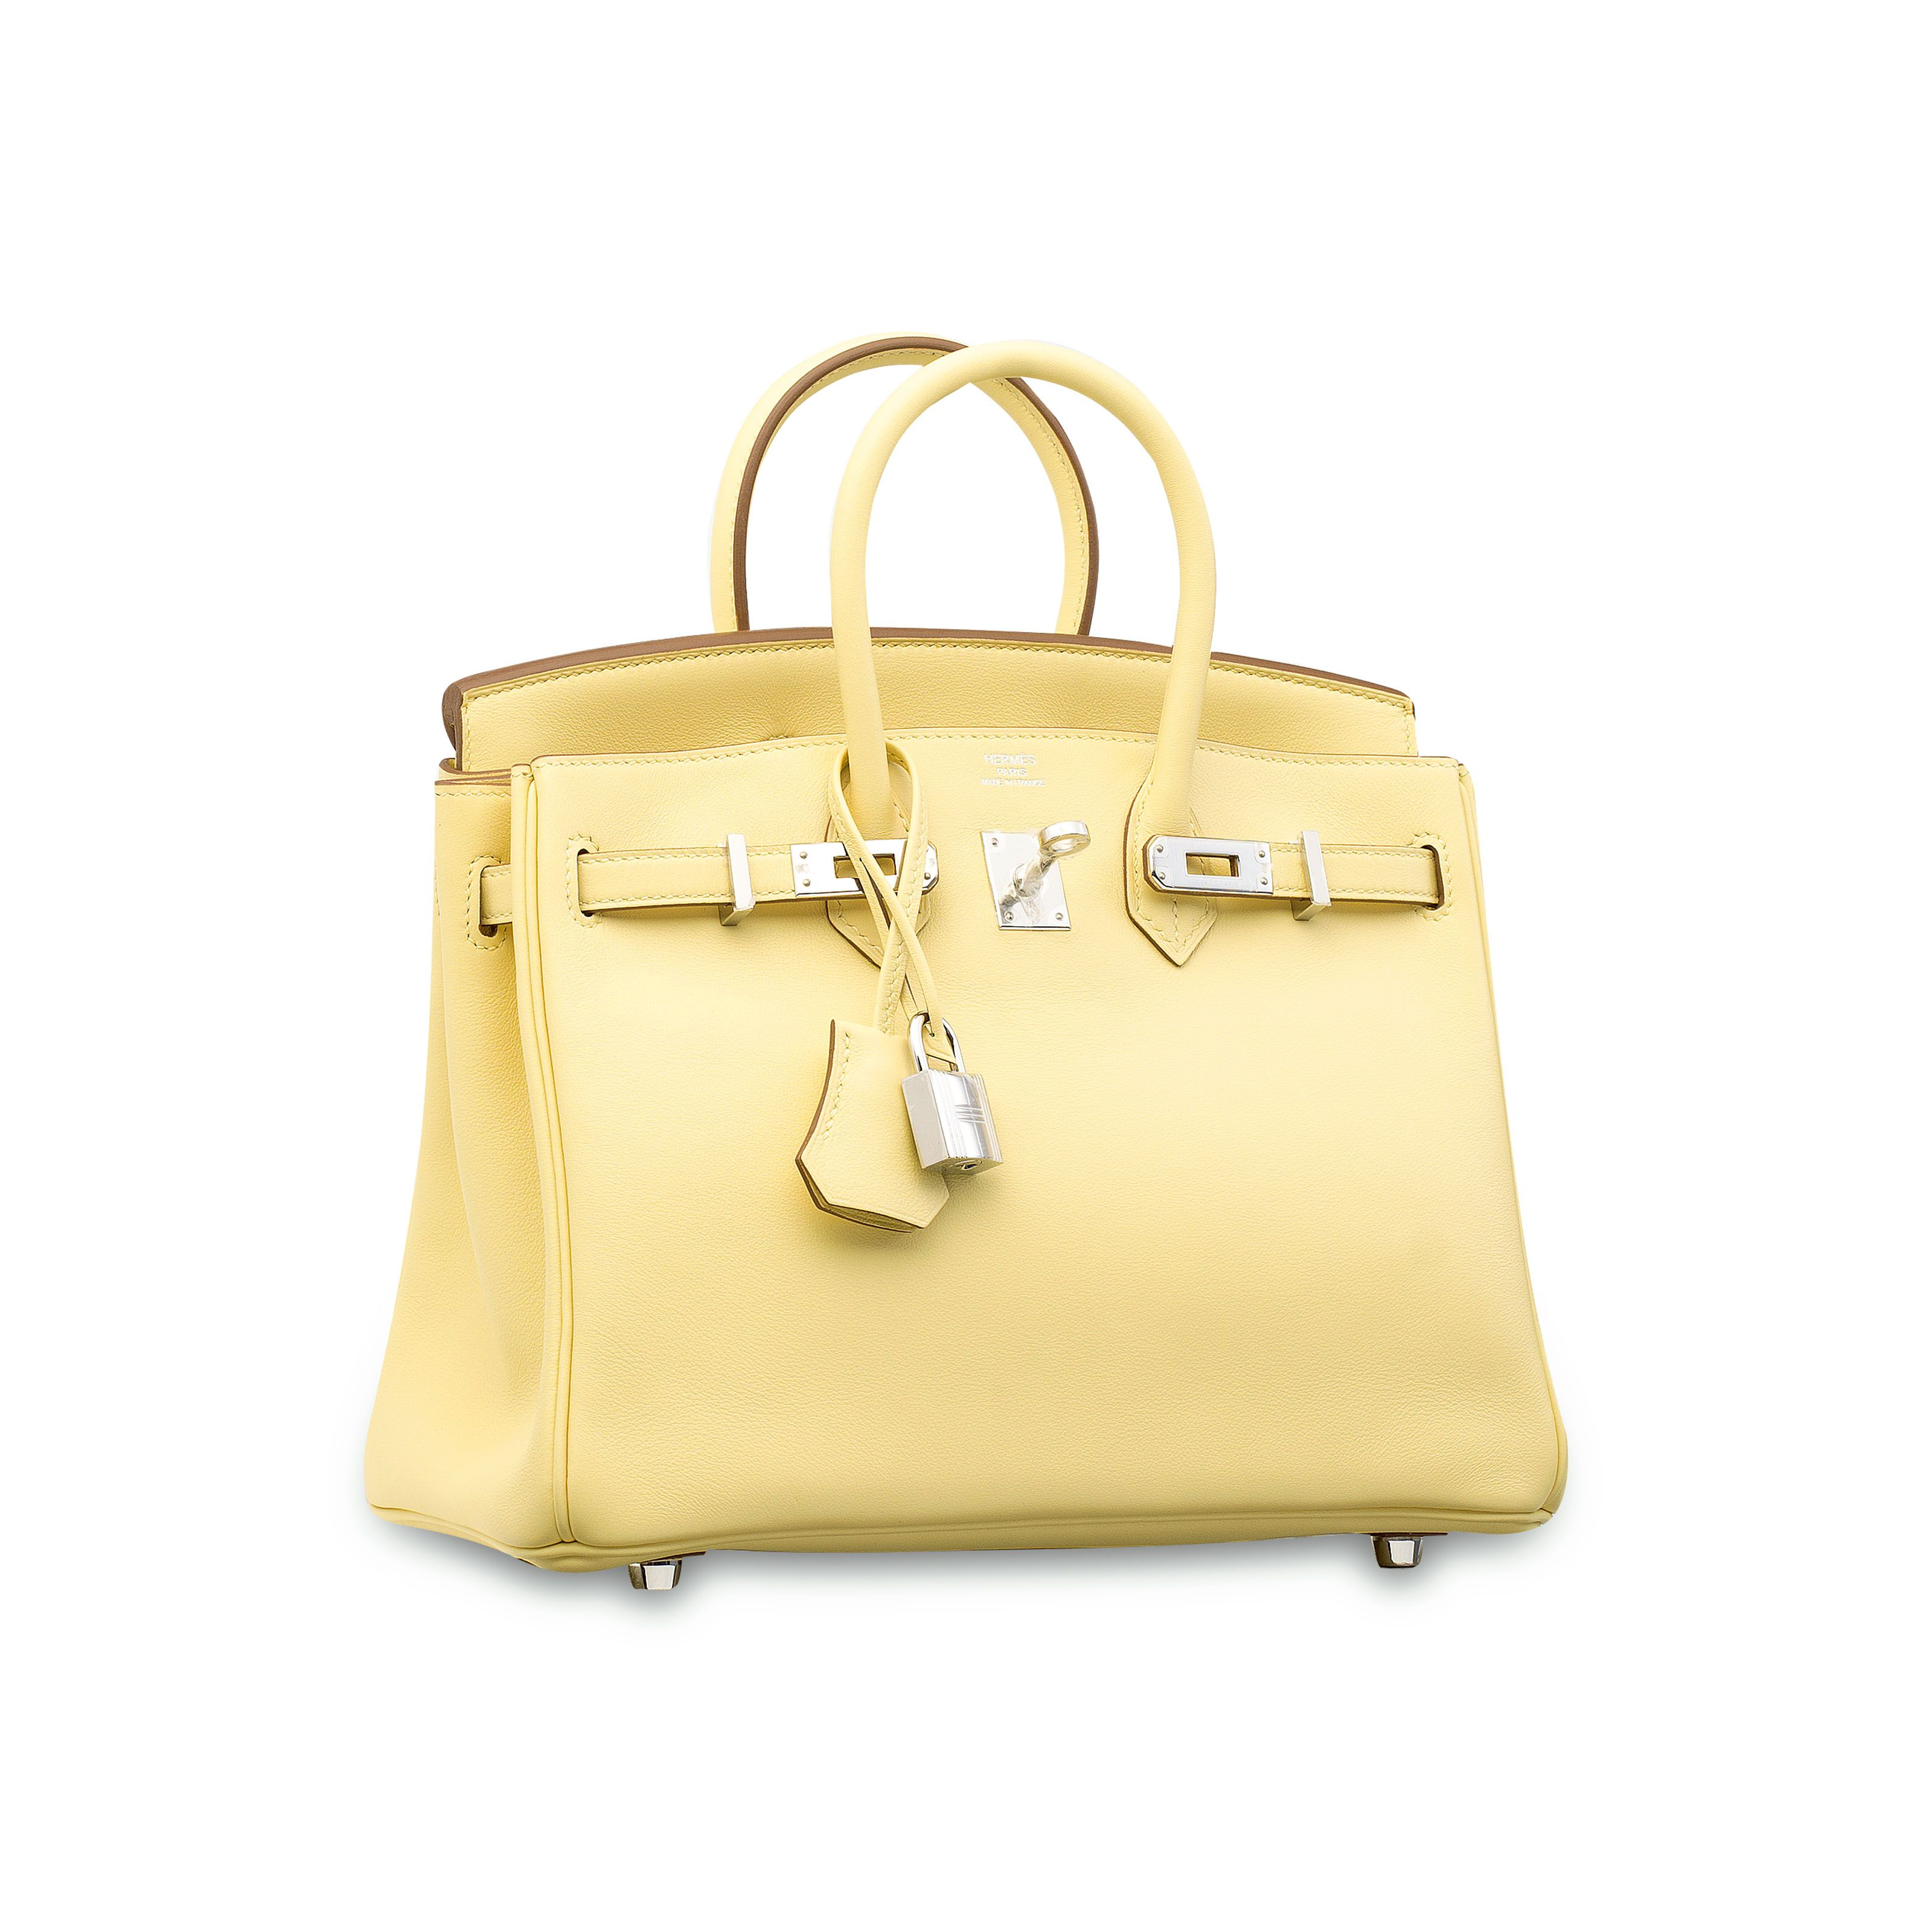 Solo mio, 12 bolsos de diversos colores, Hermes❤️ (com